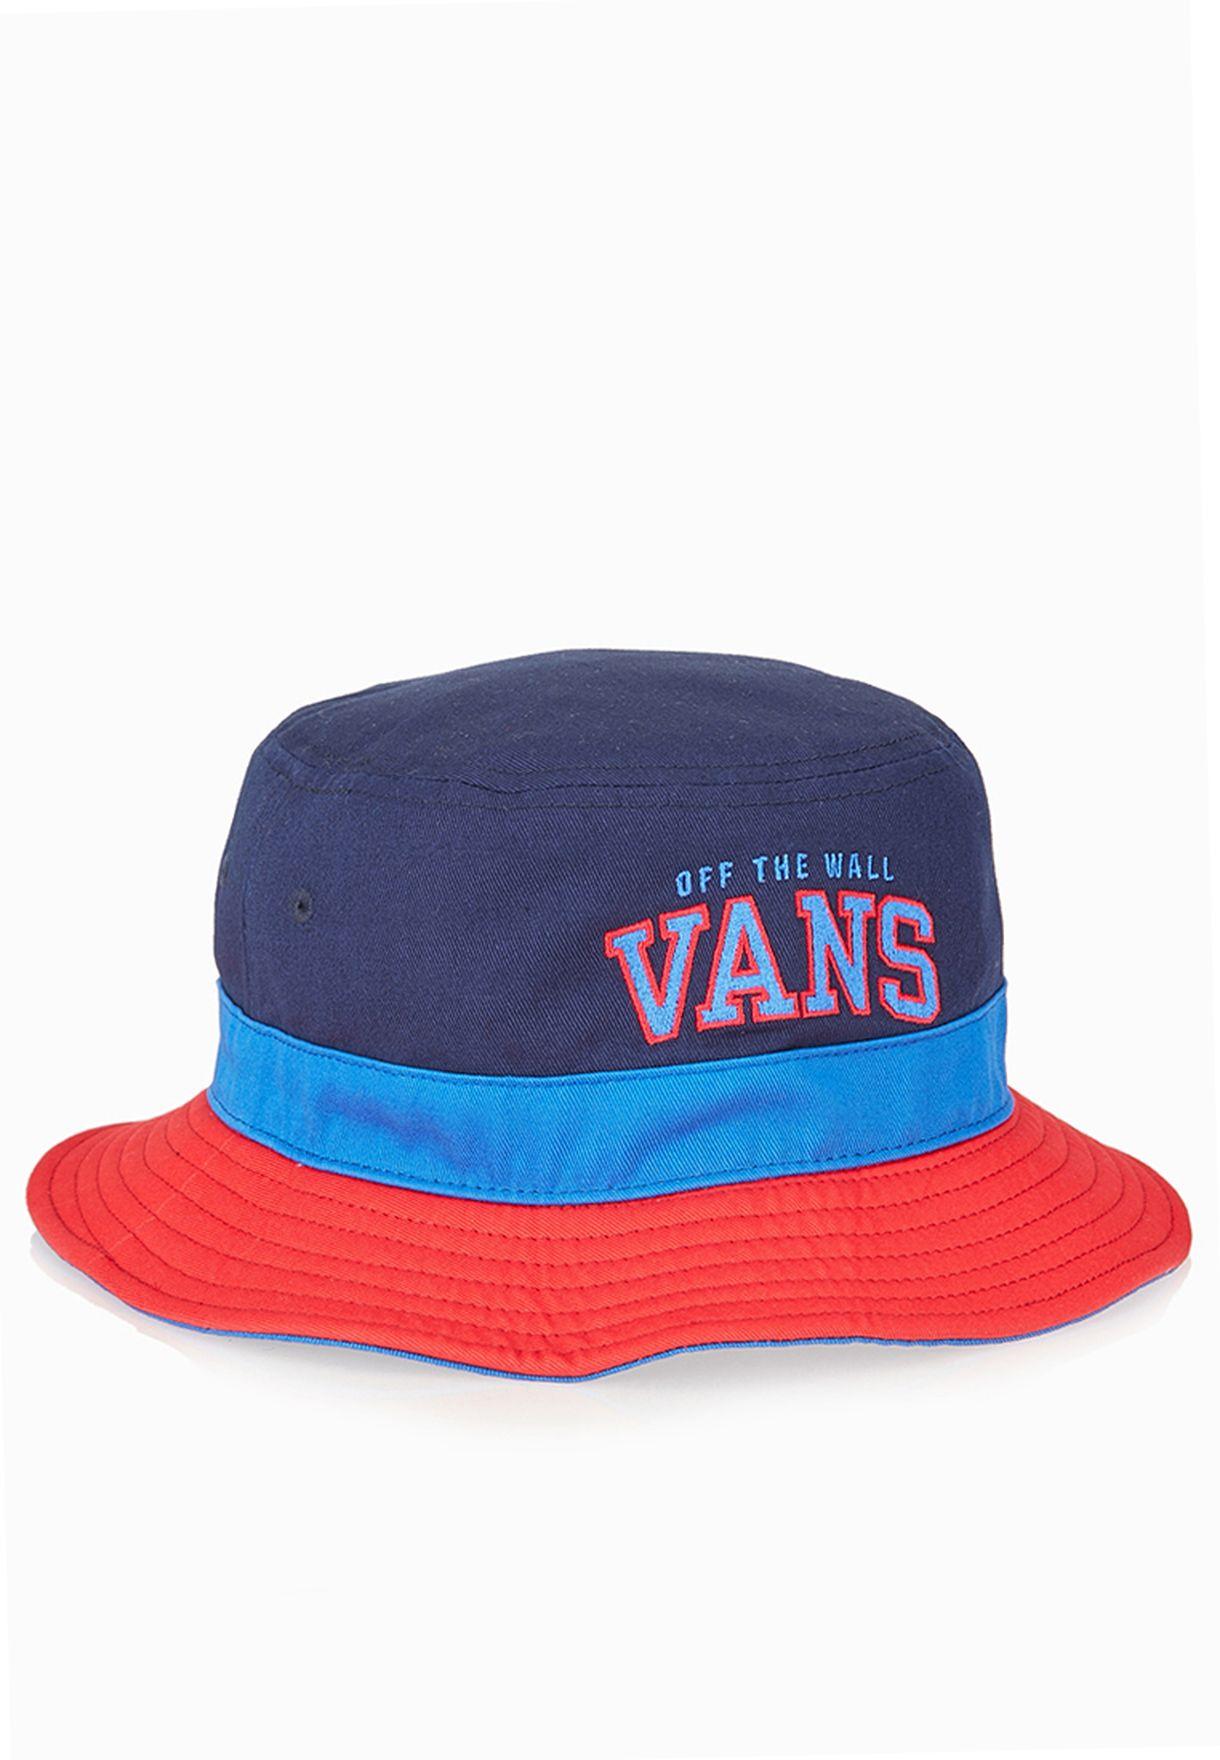 3a80d61db71 Shop Vans red Undertone Bucket Hat VAAC-0YMFVW for Men in Oman -  VA088AC88LIL